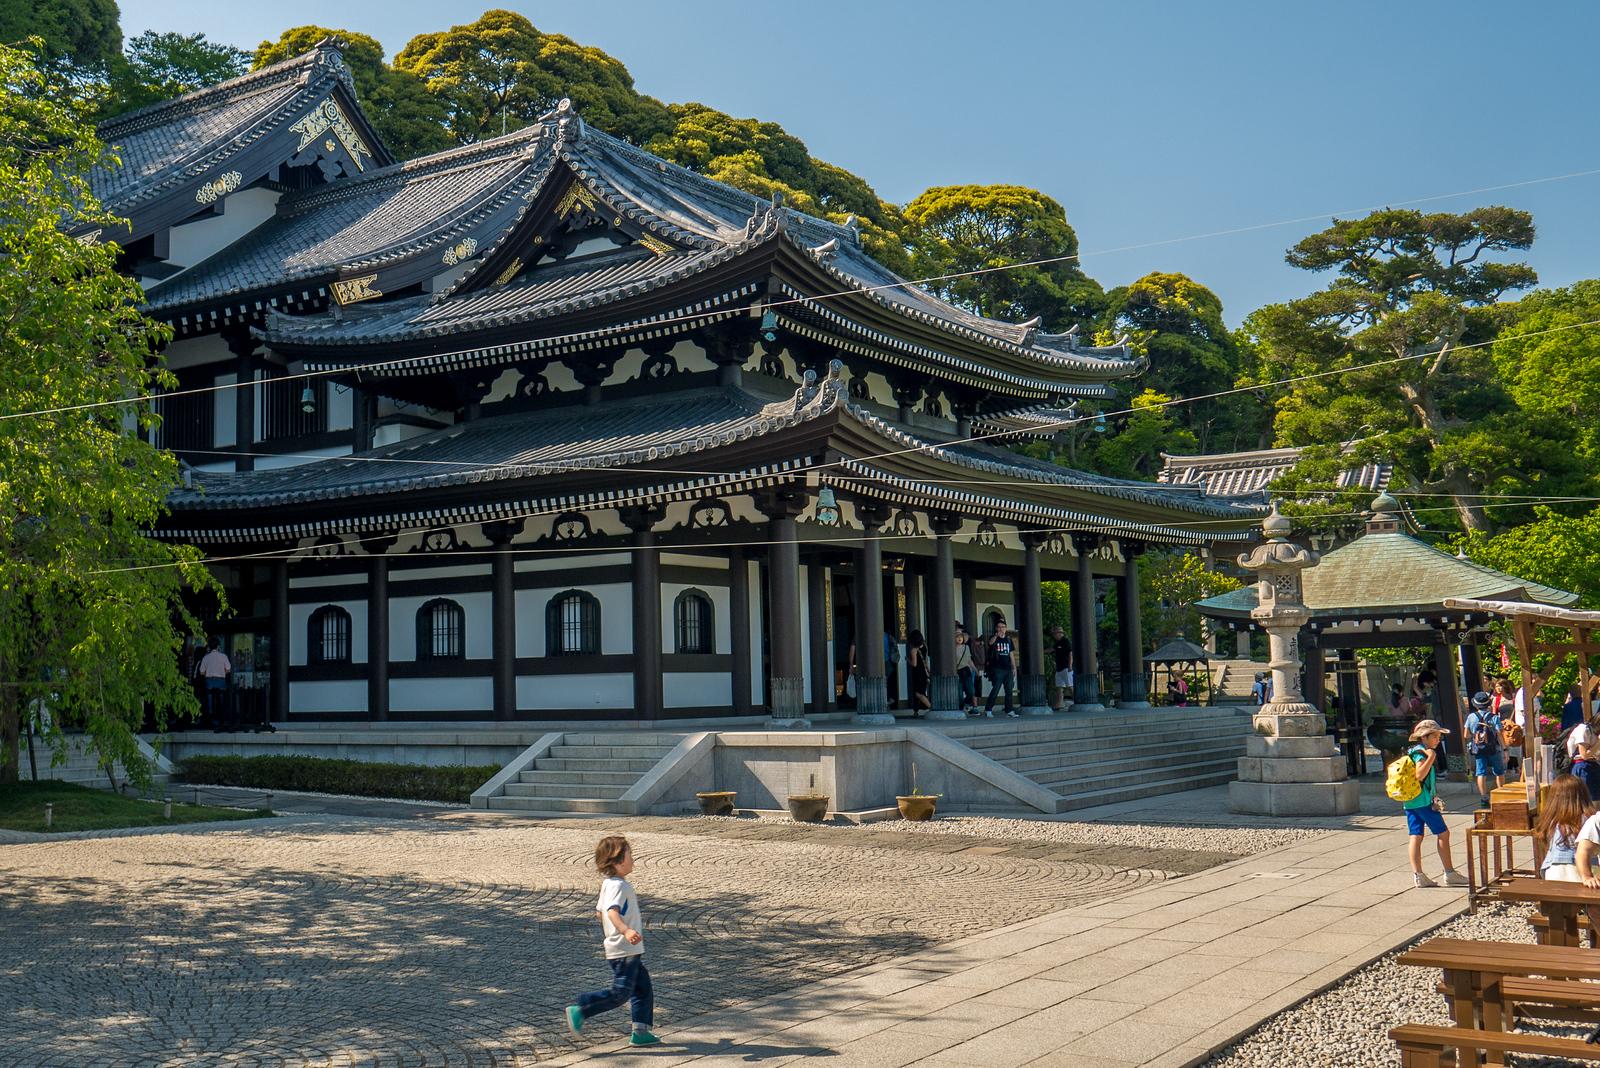 Hase-dera Temple in Kamakura, Japan